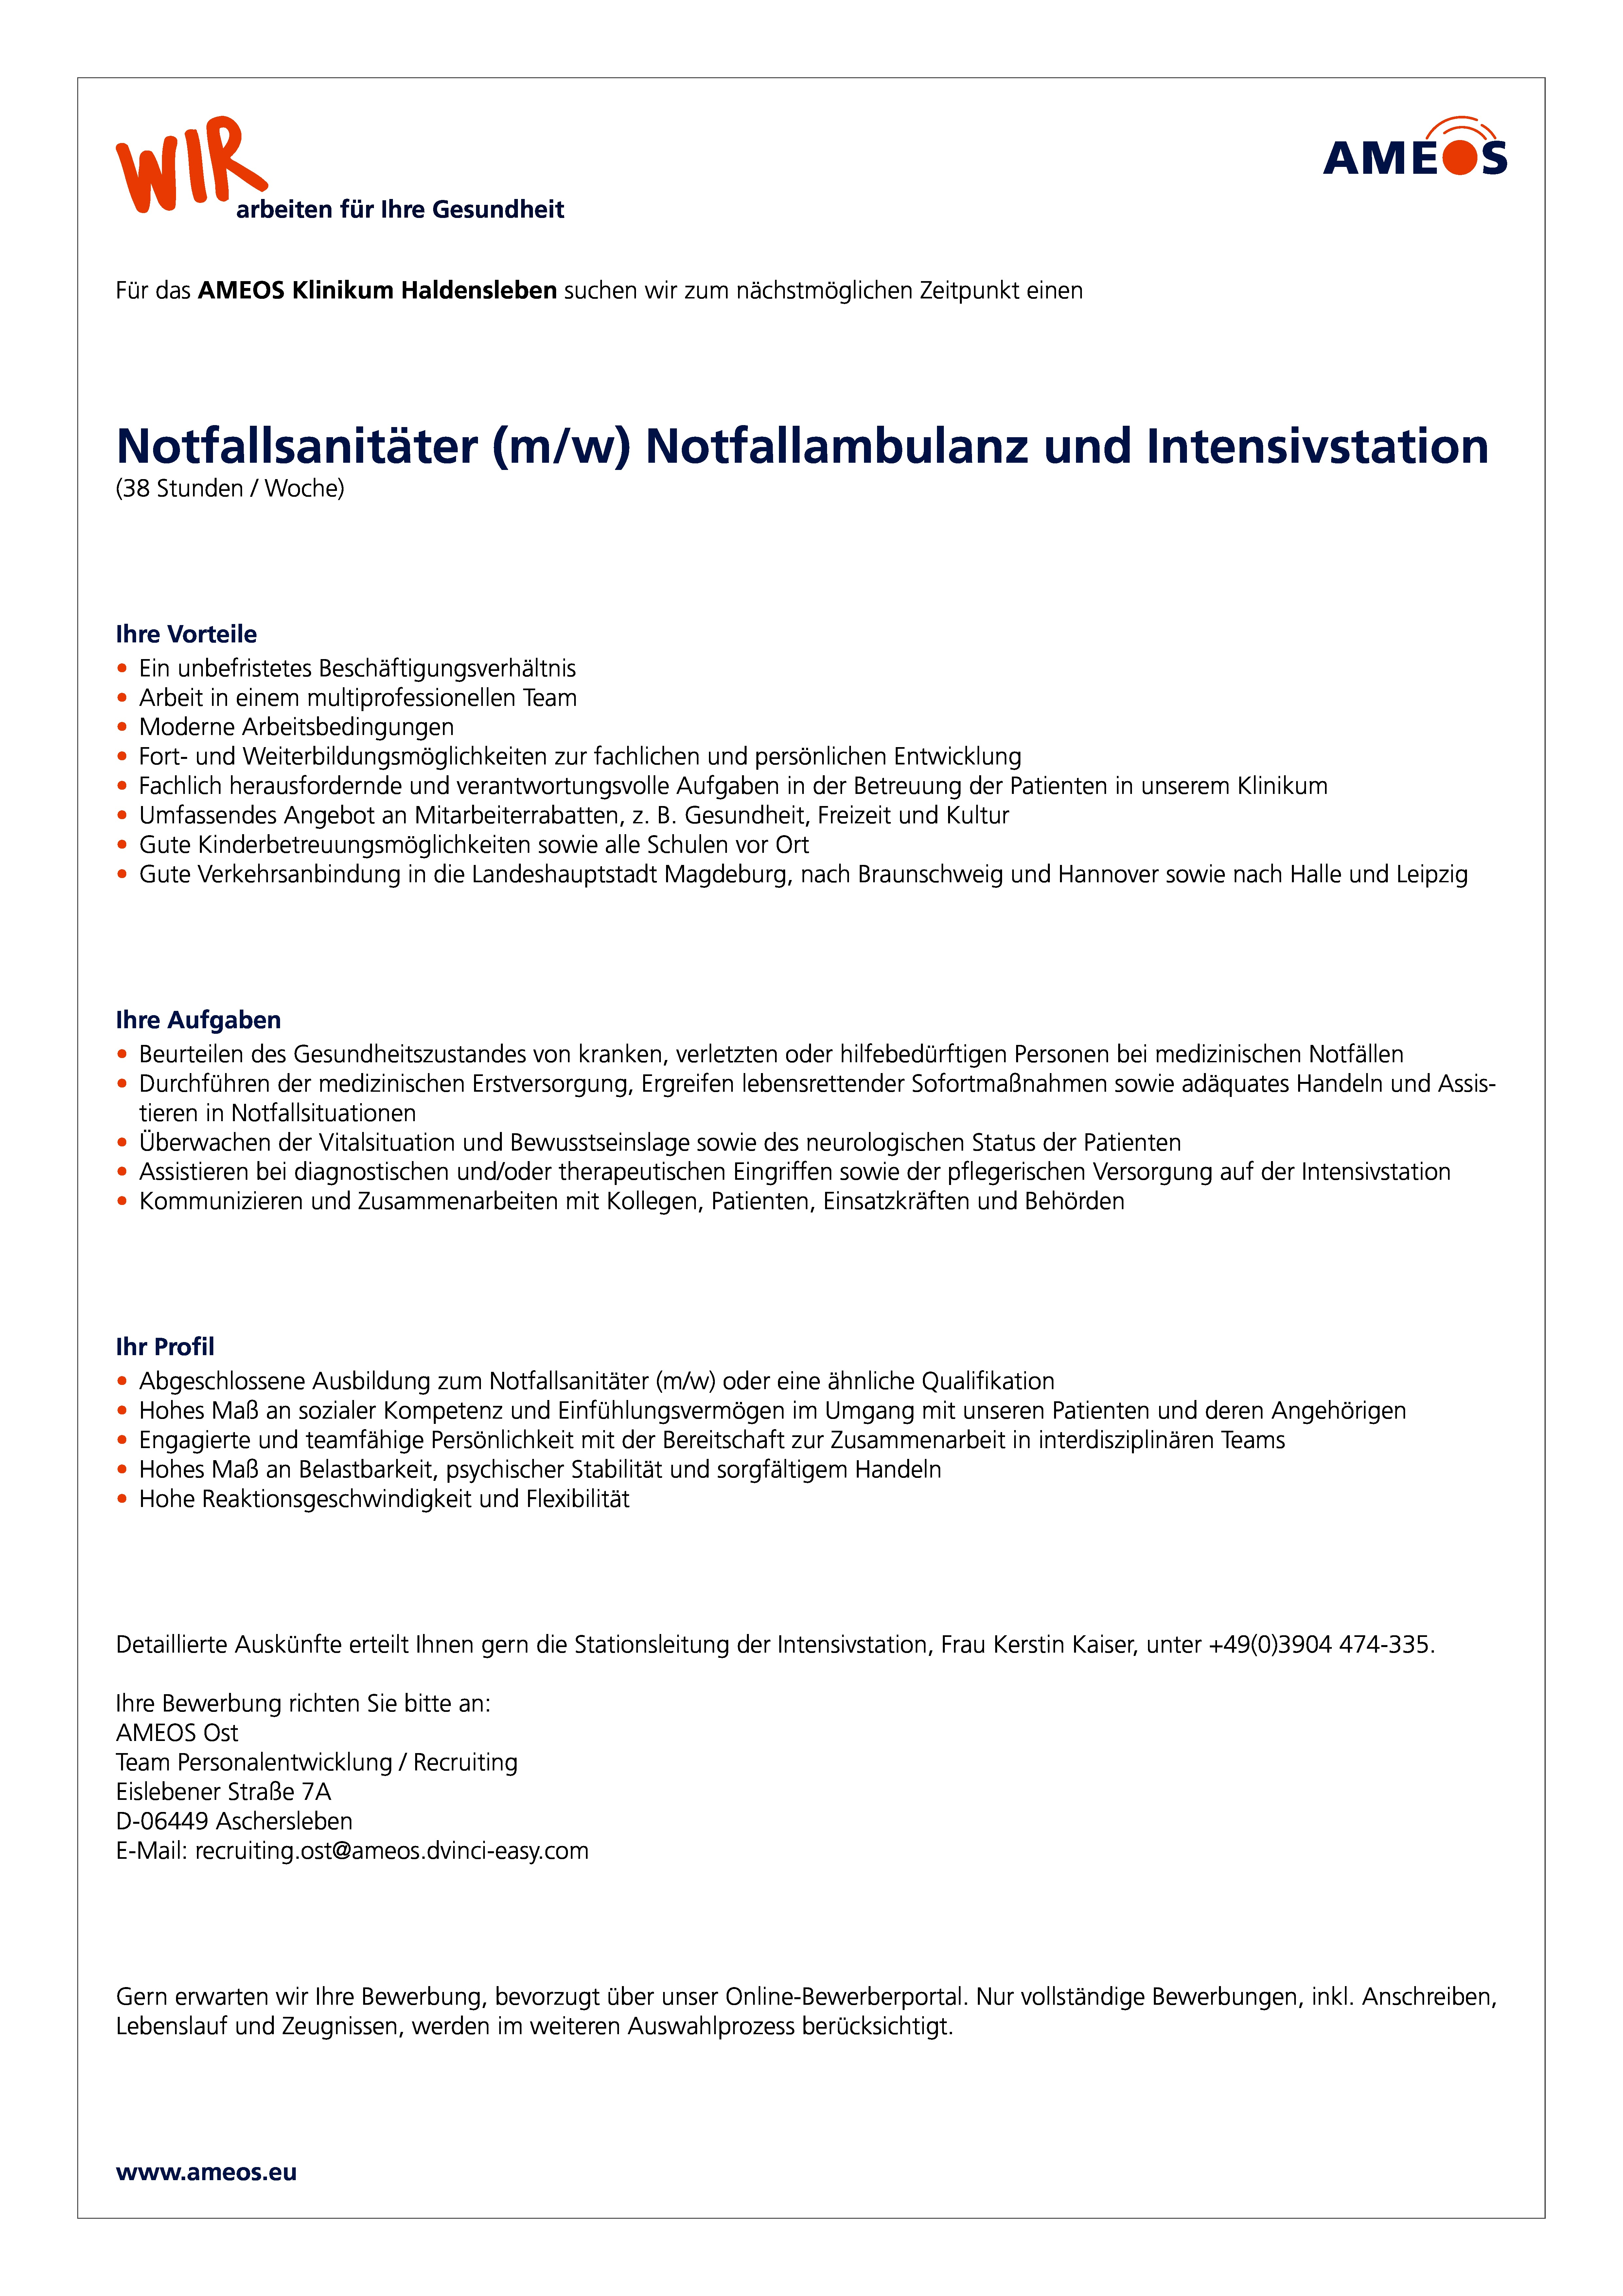 notfallsanitter mw notfallambulanz und intensivstation - Bewerbung Notfallsanitater